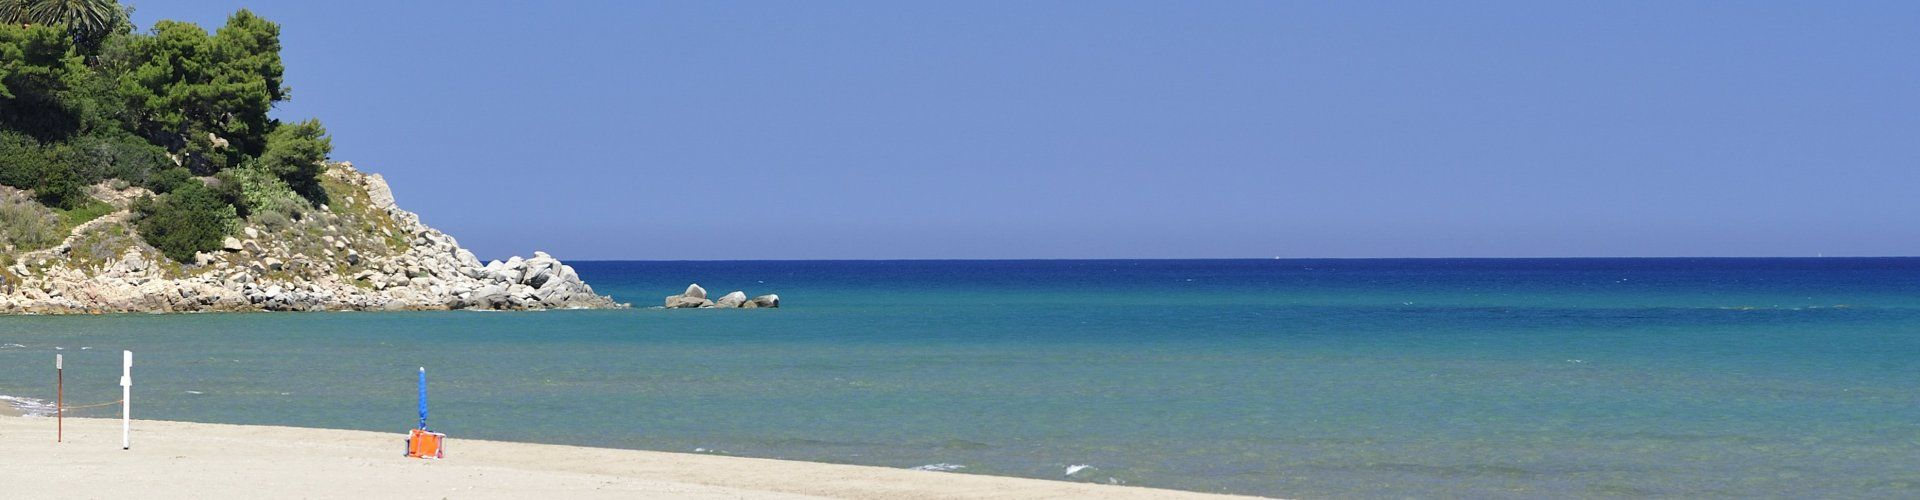 Torresalinas Beach